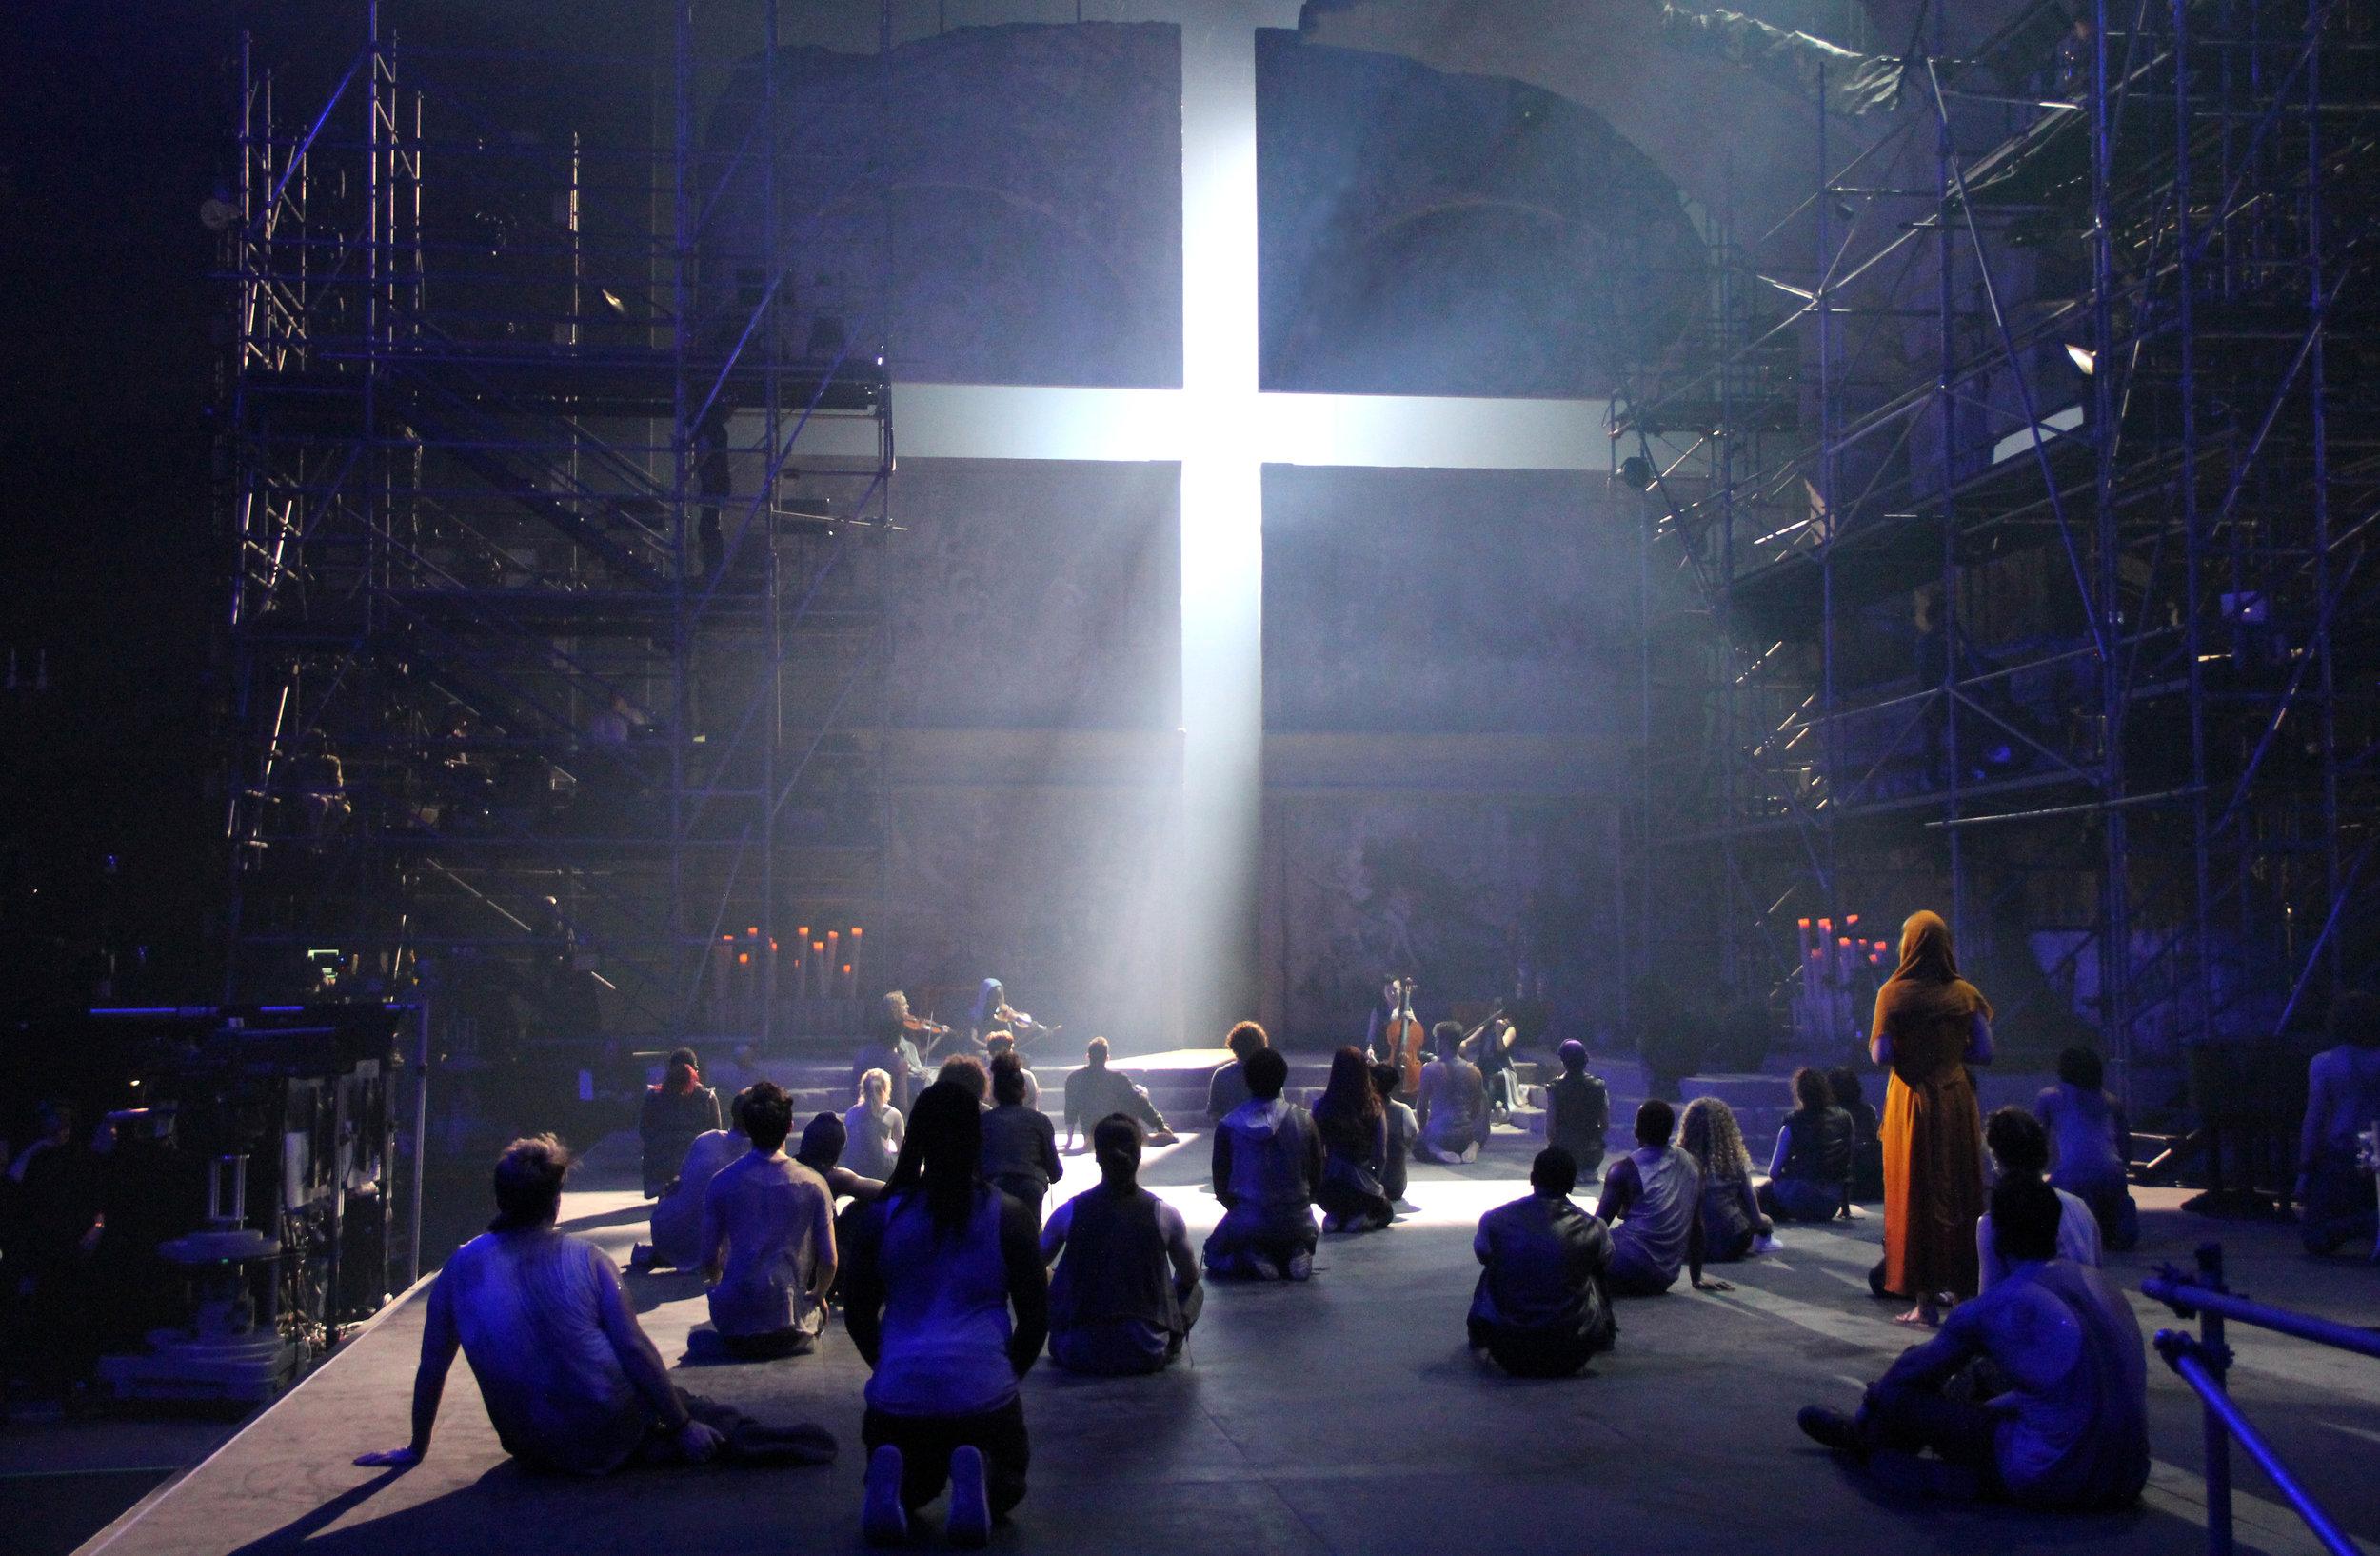 Jesus-Christ-Superstar-Act-10-Crucifixion-04.jpg